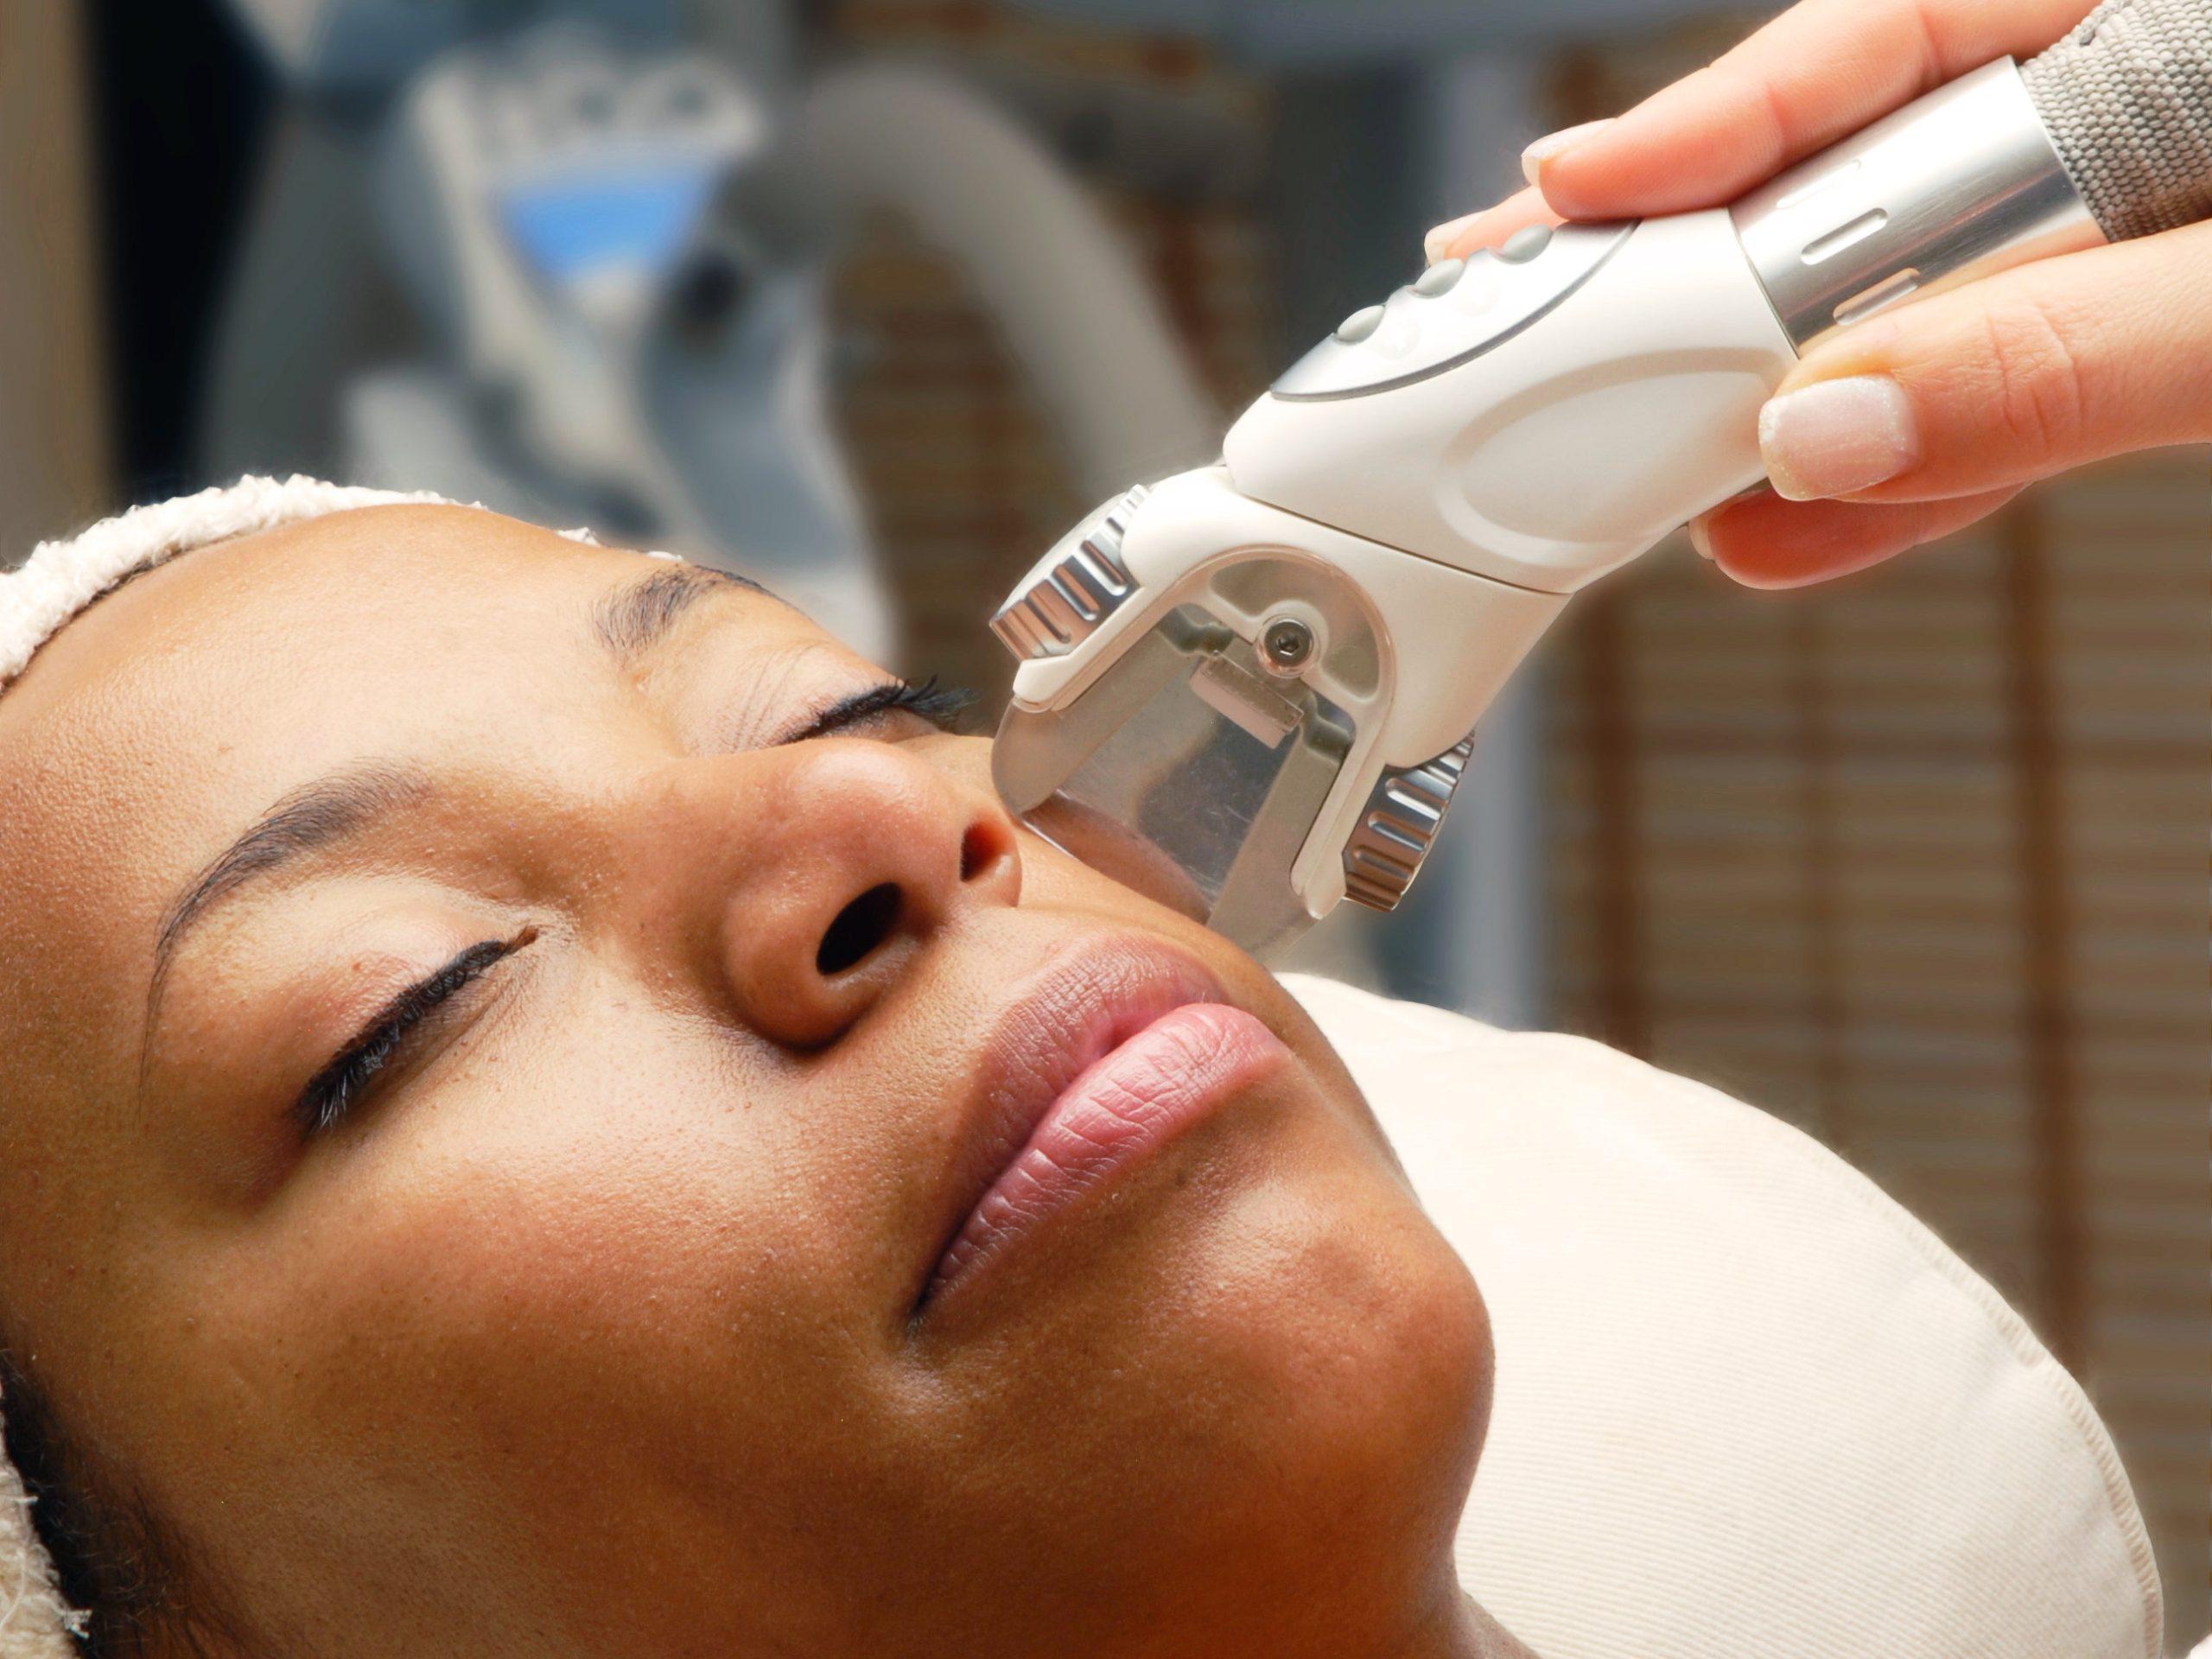 black-woman-medical-treatment-spa